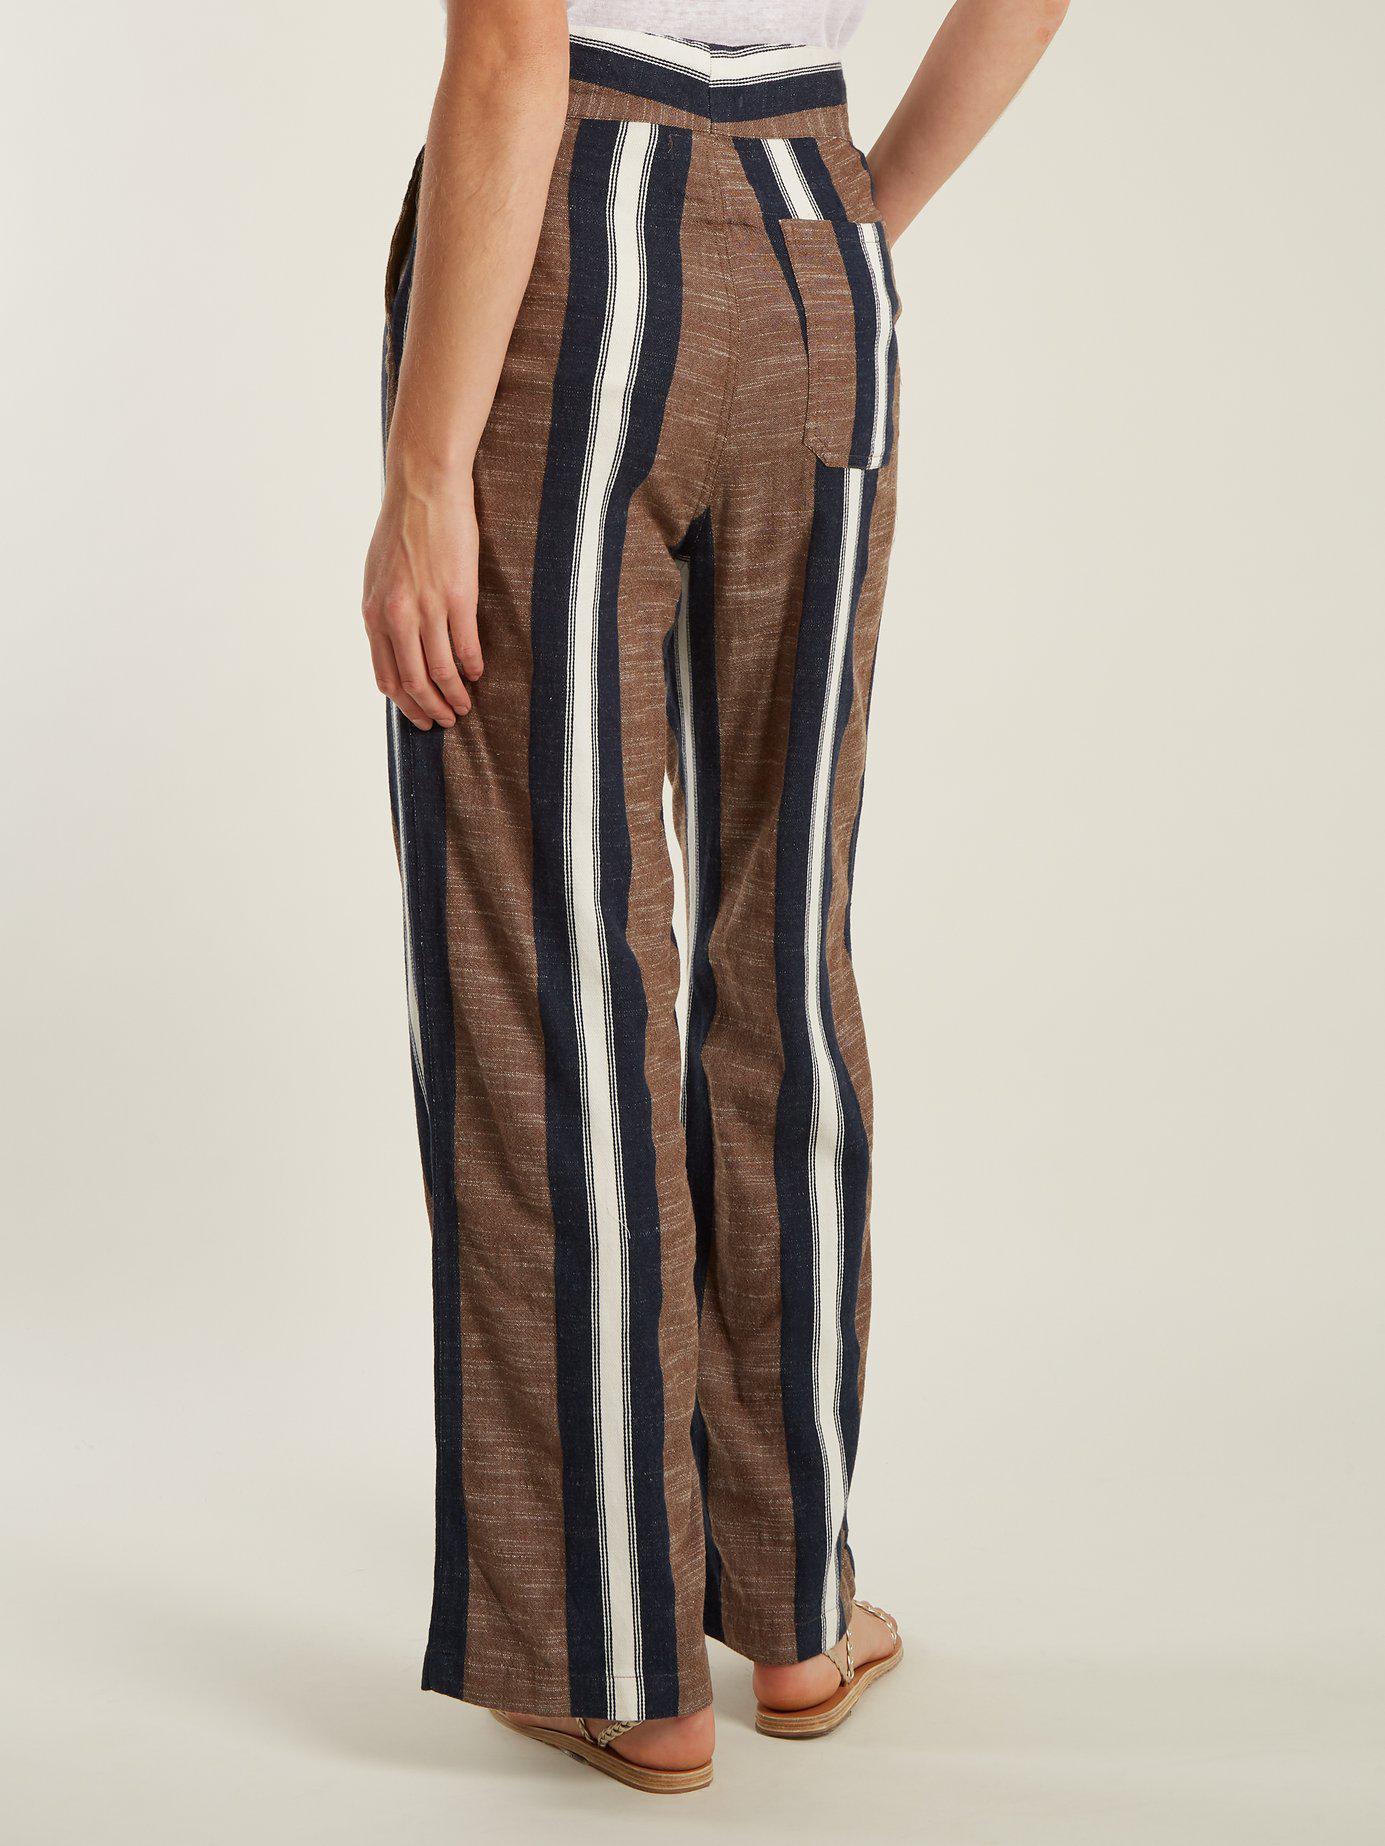 Pantalon ample rayé DavisAce & Jig Vente Ebay Pas Cher a1MH9rh5i